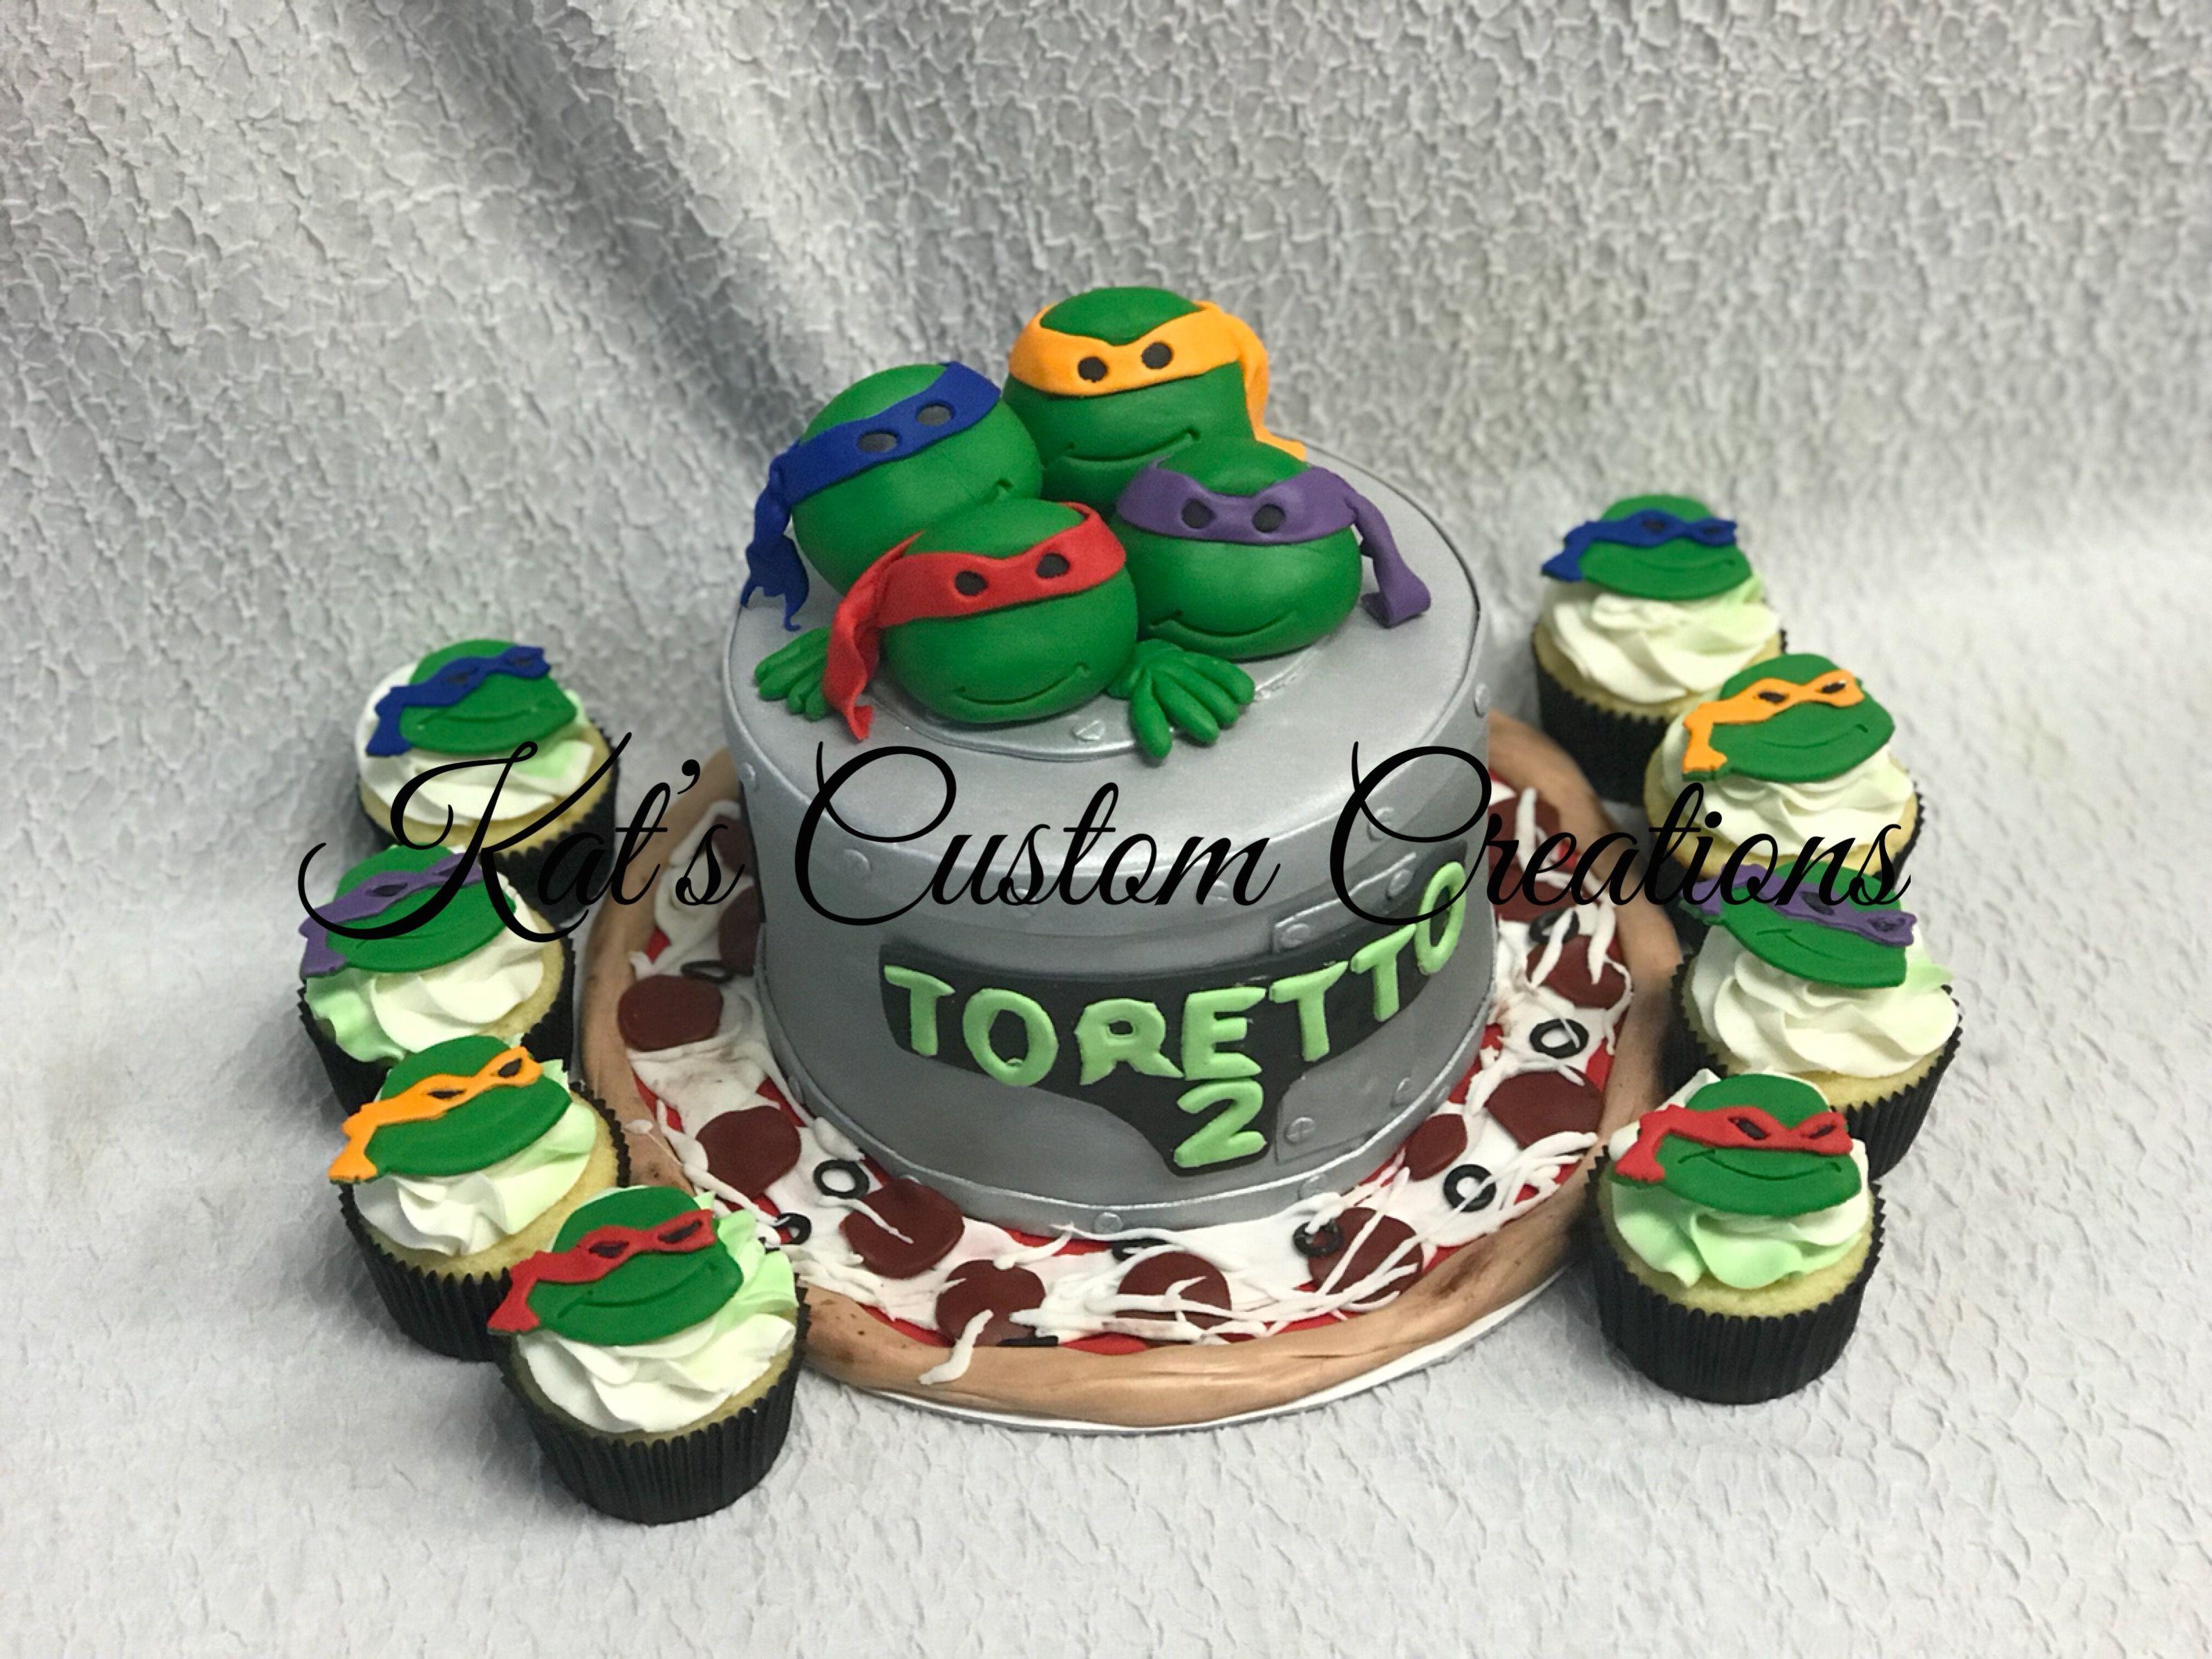 Teenage Mutant Ninja Turtles Cake And Cupcakes Ninja Turtle Cake Teenage Mutant Ninja Turtle Cake Boy Birthday Cake